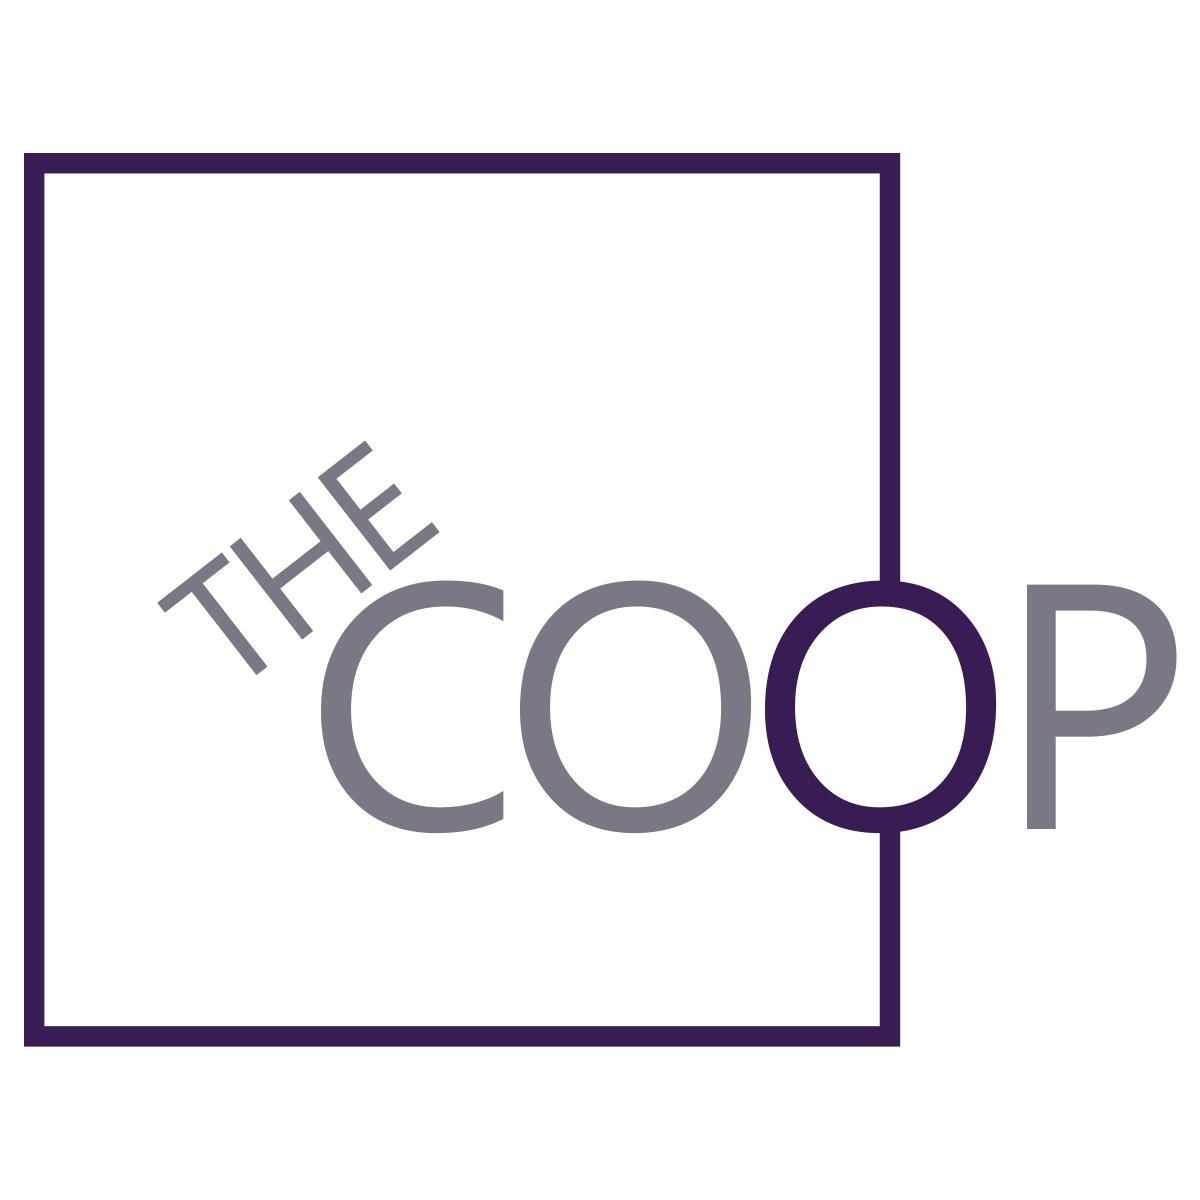 The Coop - Las Vegas, NV 89134 - (702)636-9101 | ShowMeLocal.com